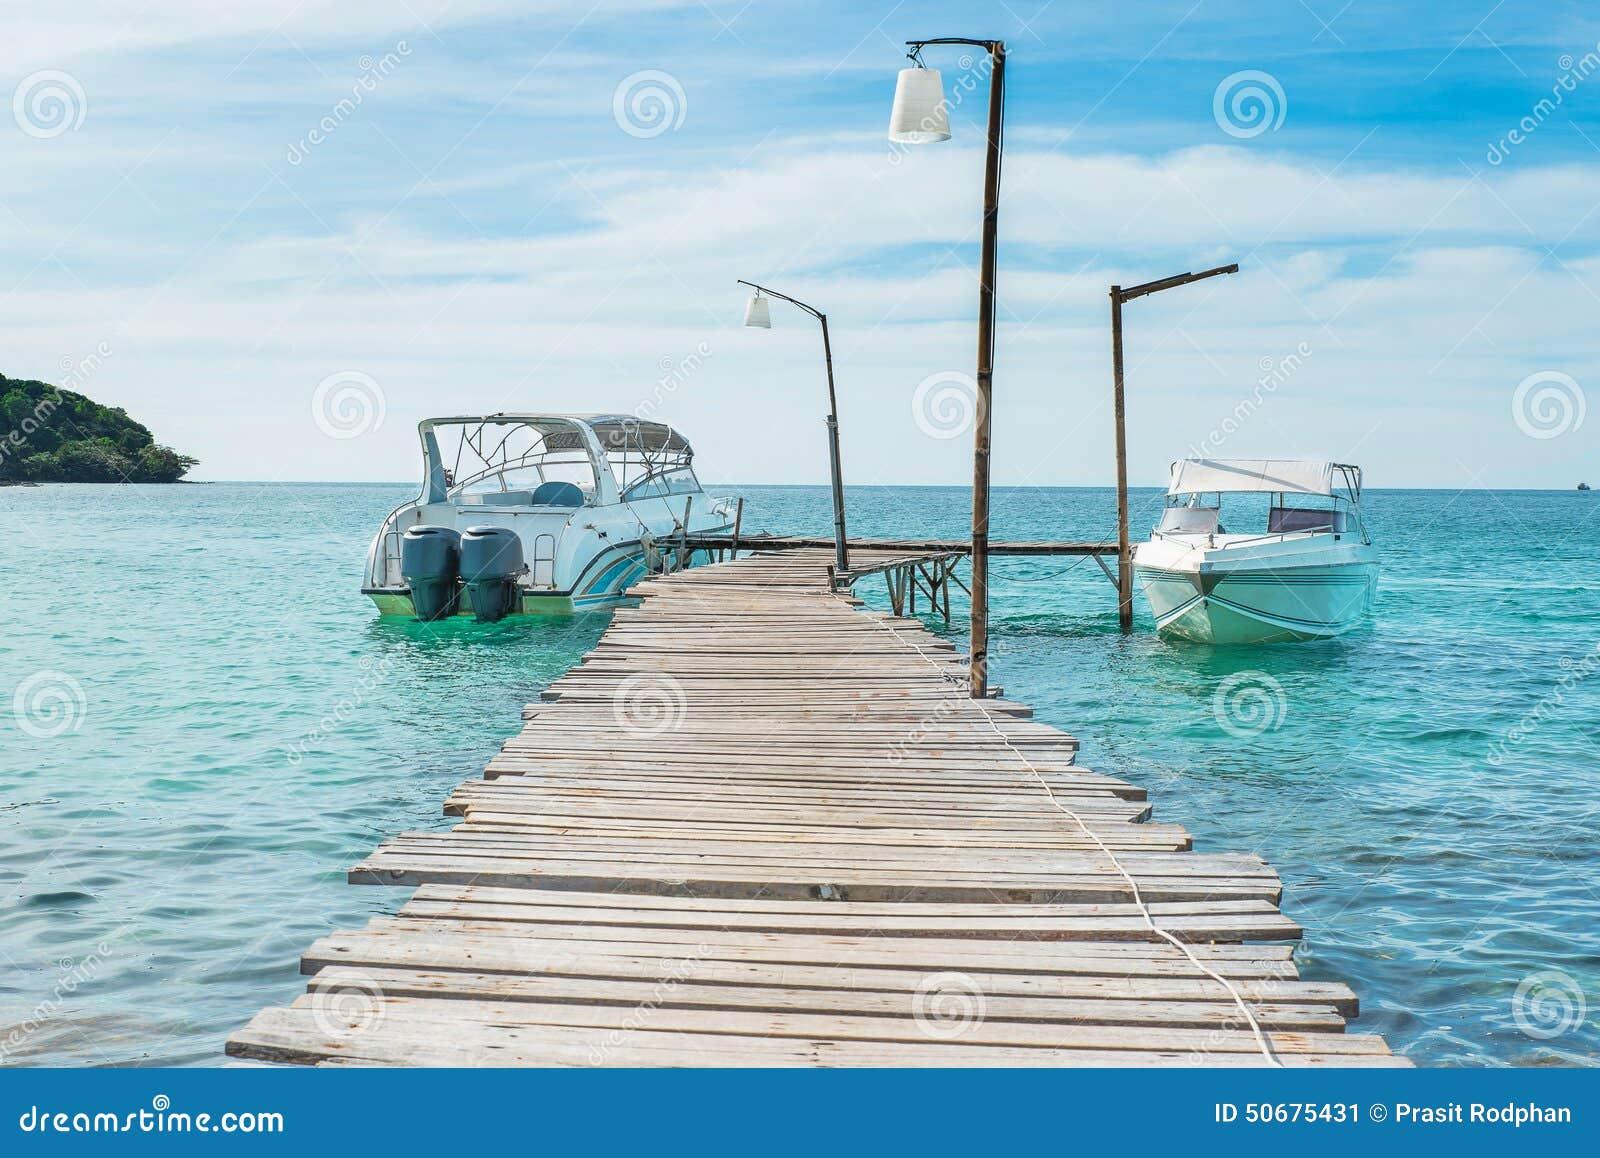 Download 假期、旅行和海概念-在蓝色海加速小船 库存图片. 图片 包括有 捕鱼, 小船, ,并且, 马达, 女演员 - 50675431